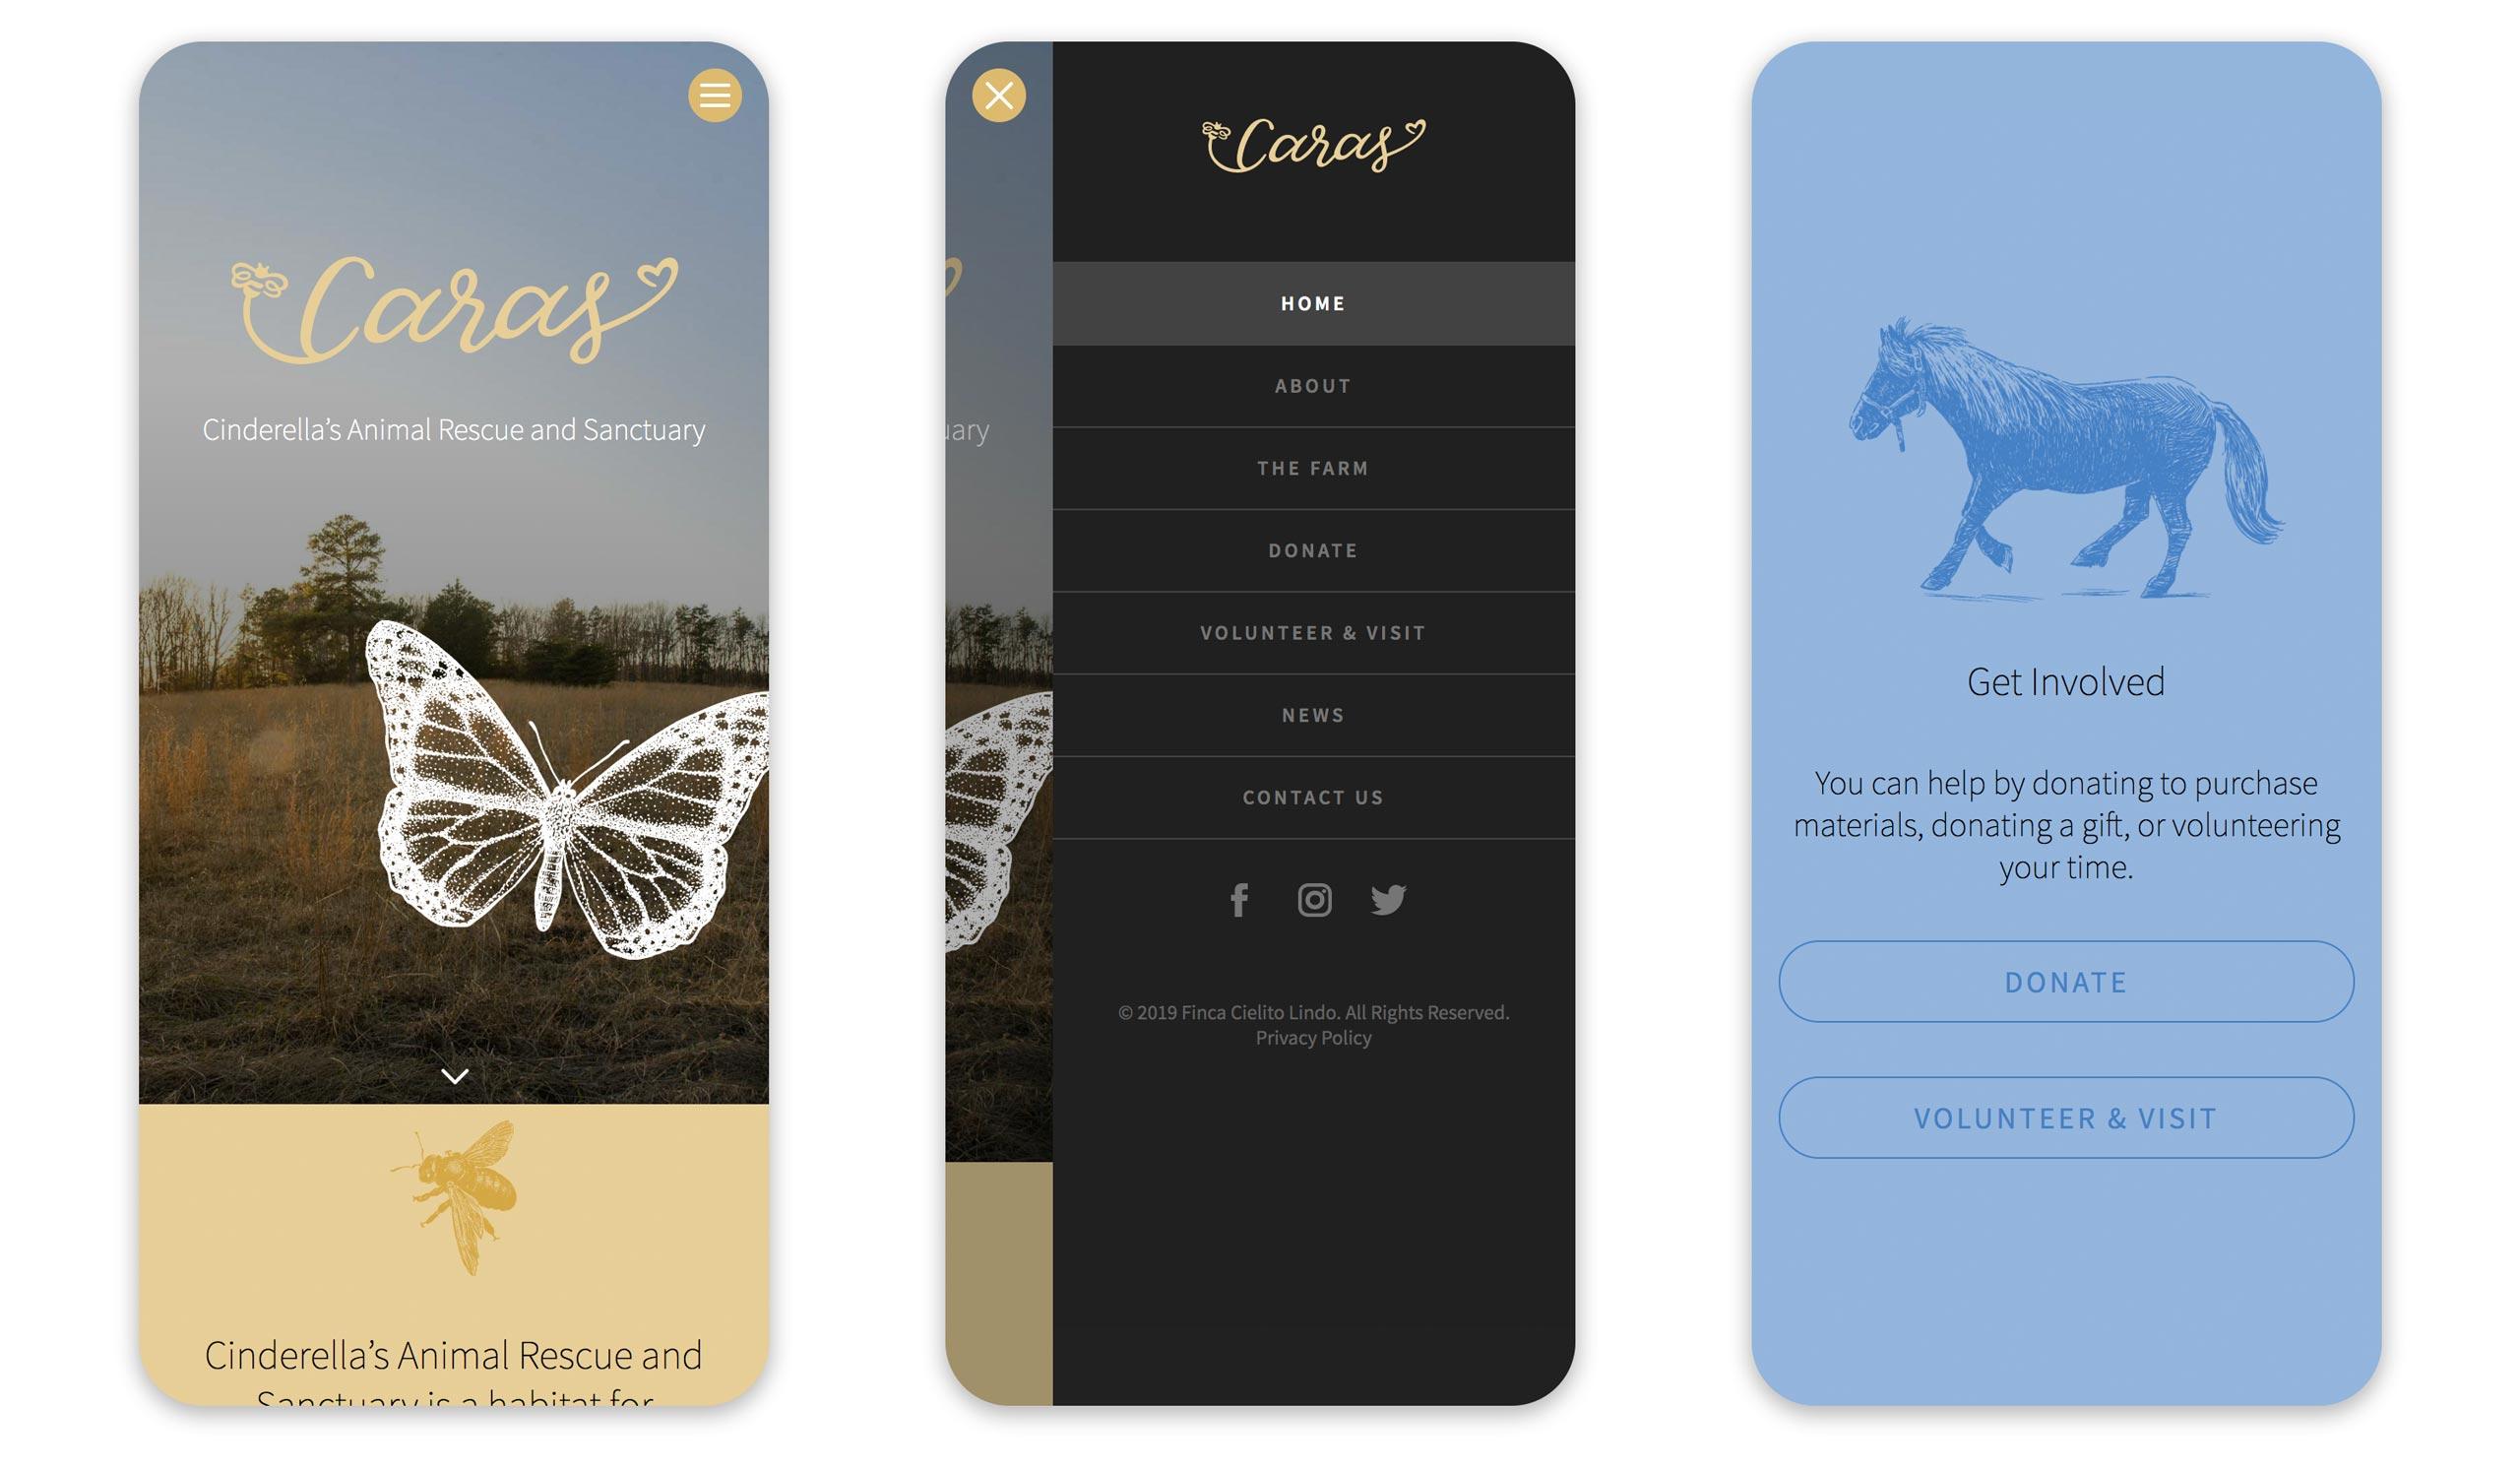 Caras mobile-first website 1